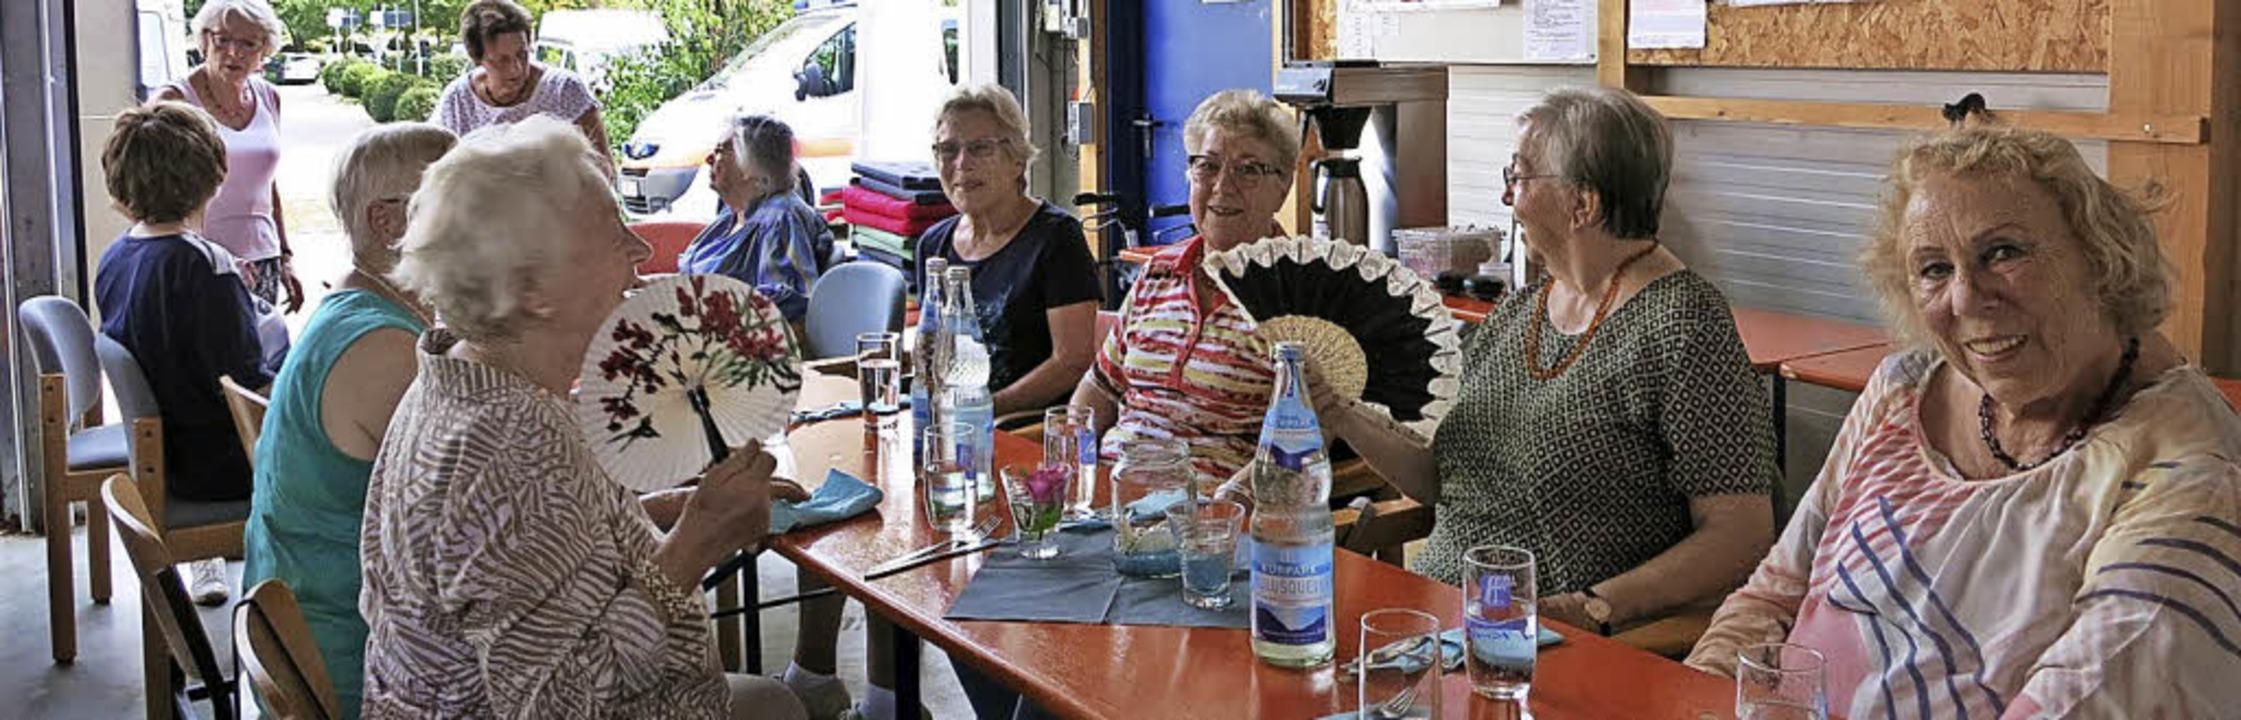 <BZ-FotoAnlauf>DRK-Sommerfest:</BZ-FotoAnlauf> Trotz Hitze war einiges los.   | Foto: DRK